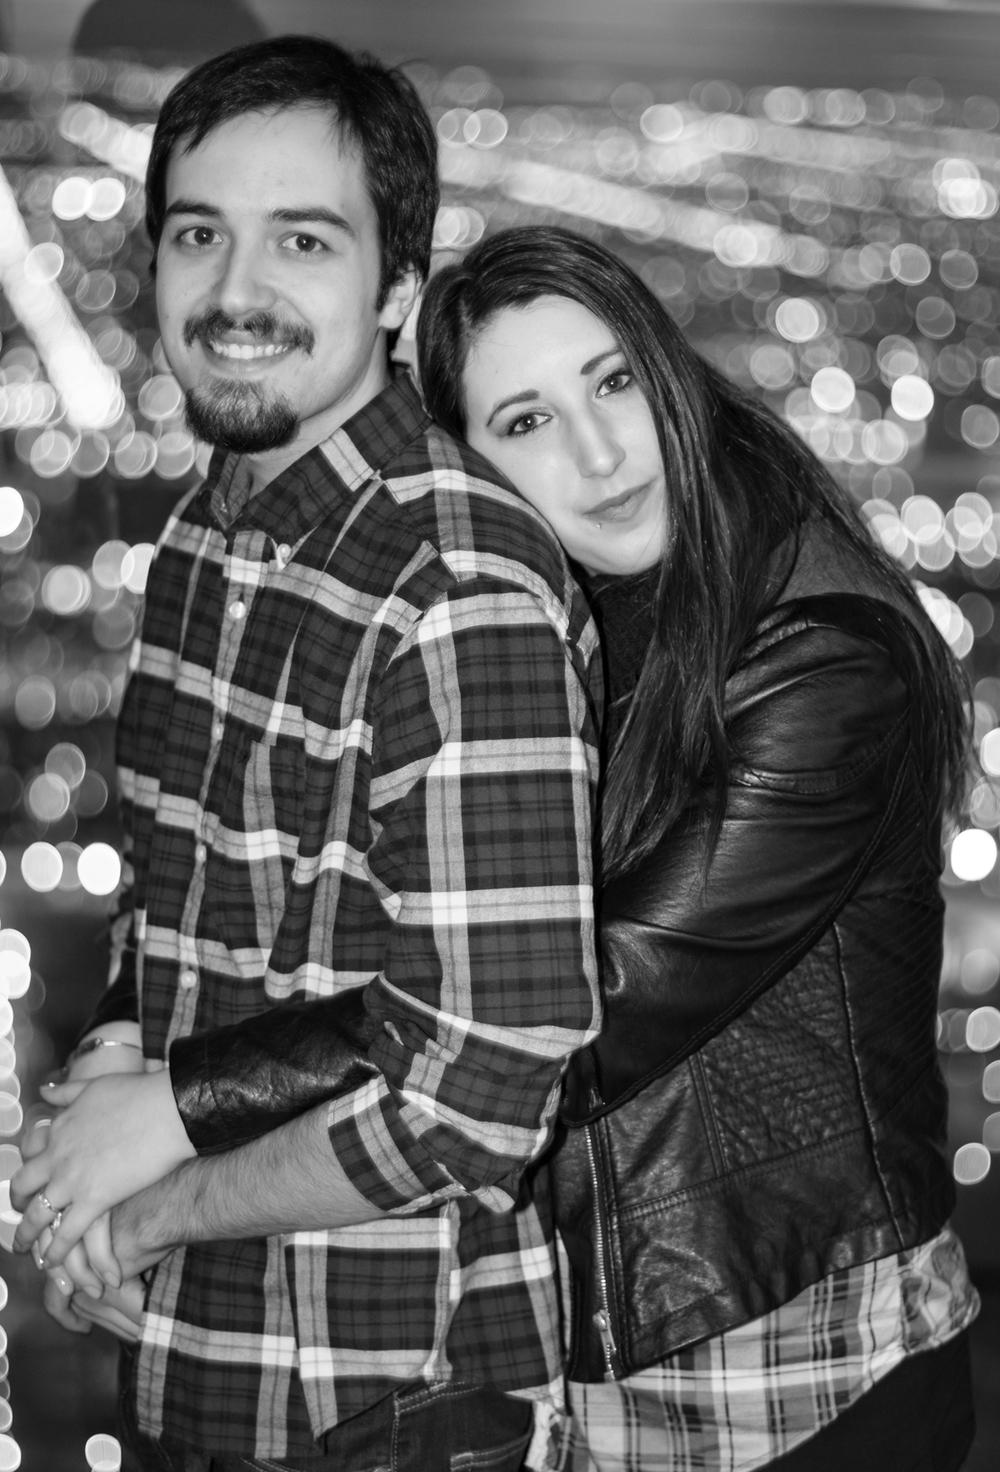 Proposal Photo